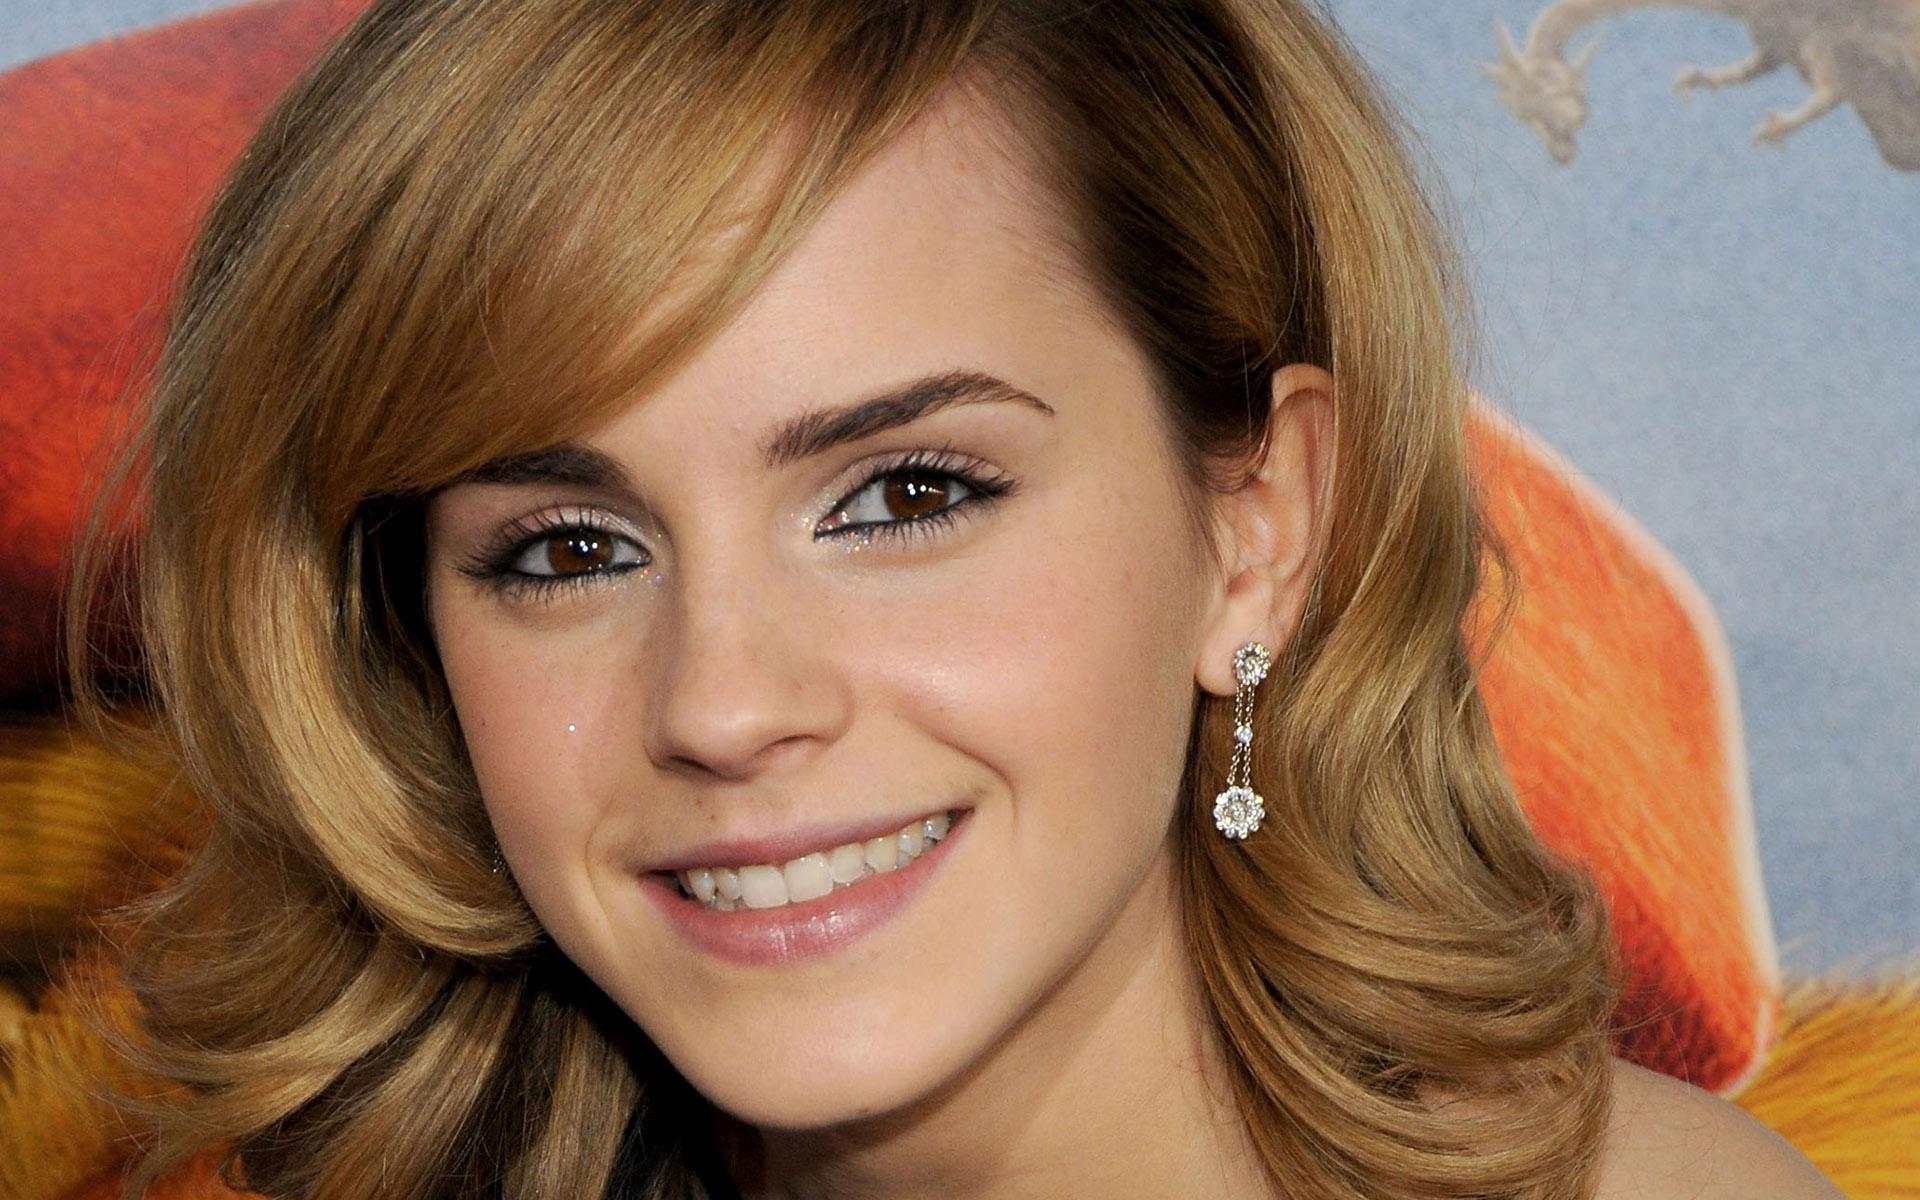 Emma Watson Wallpaper 1920x1200 37516